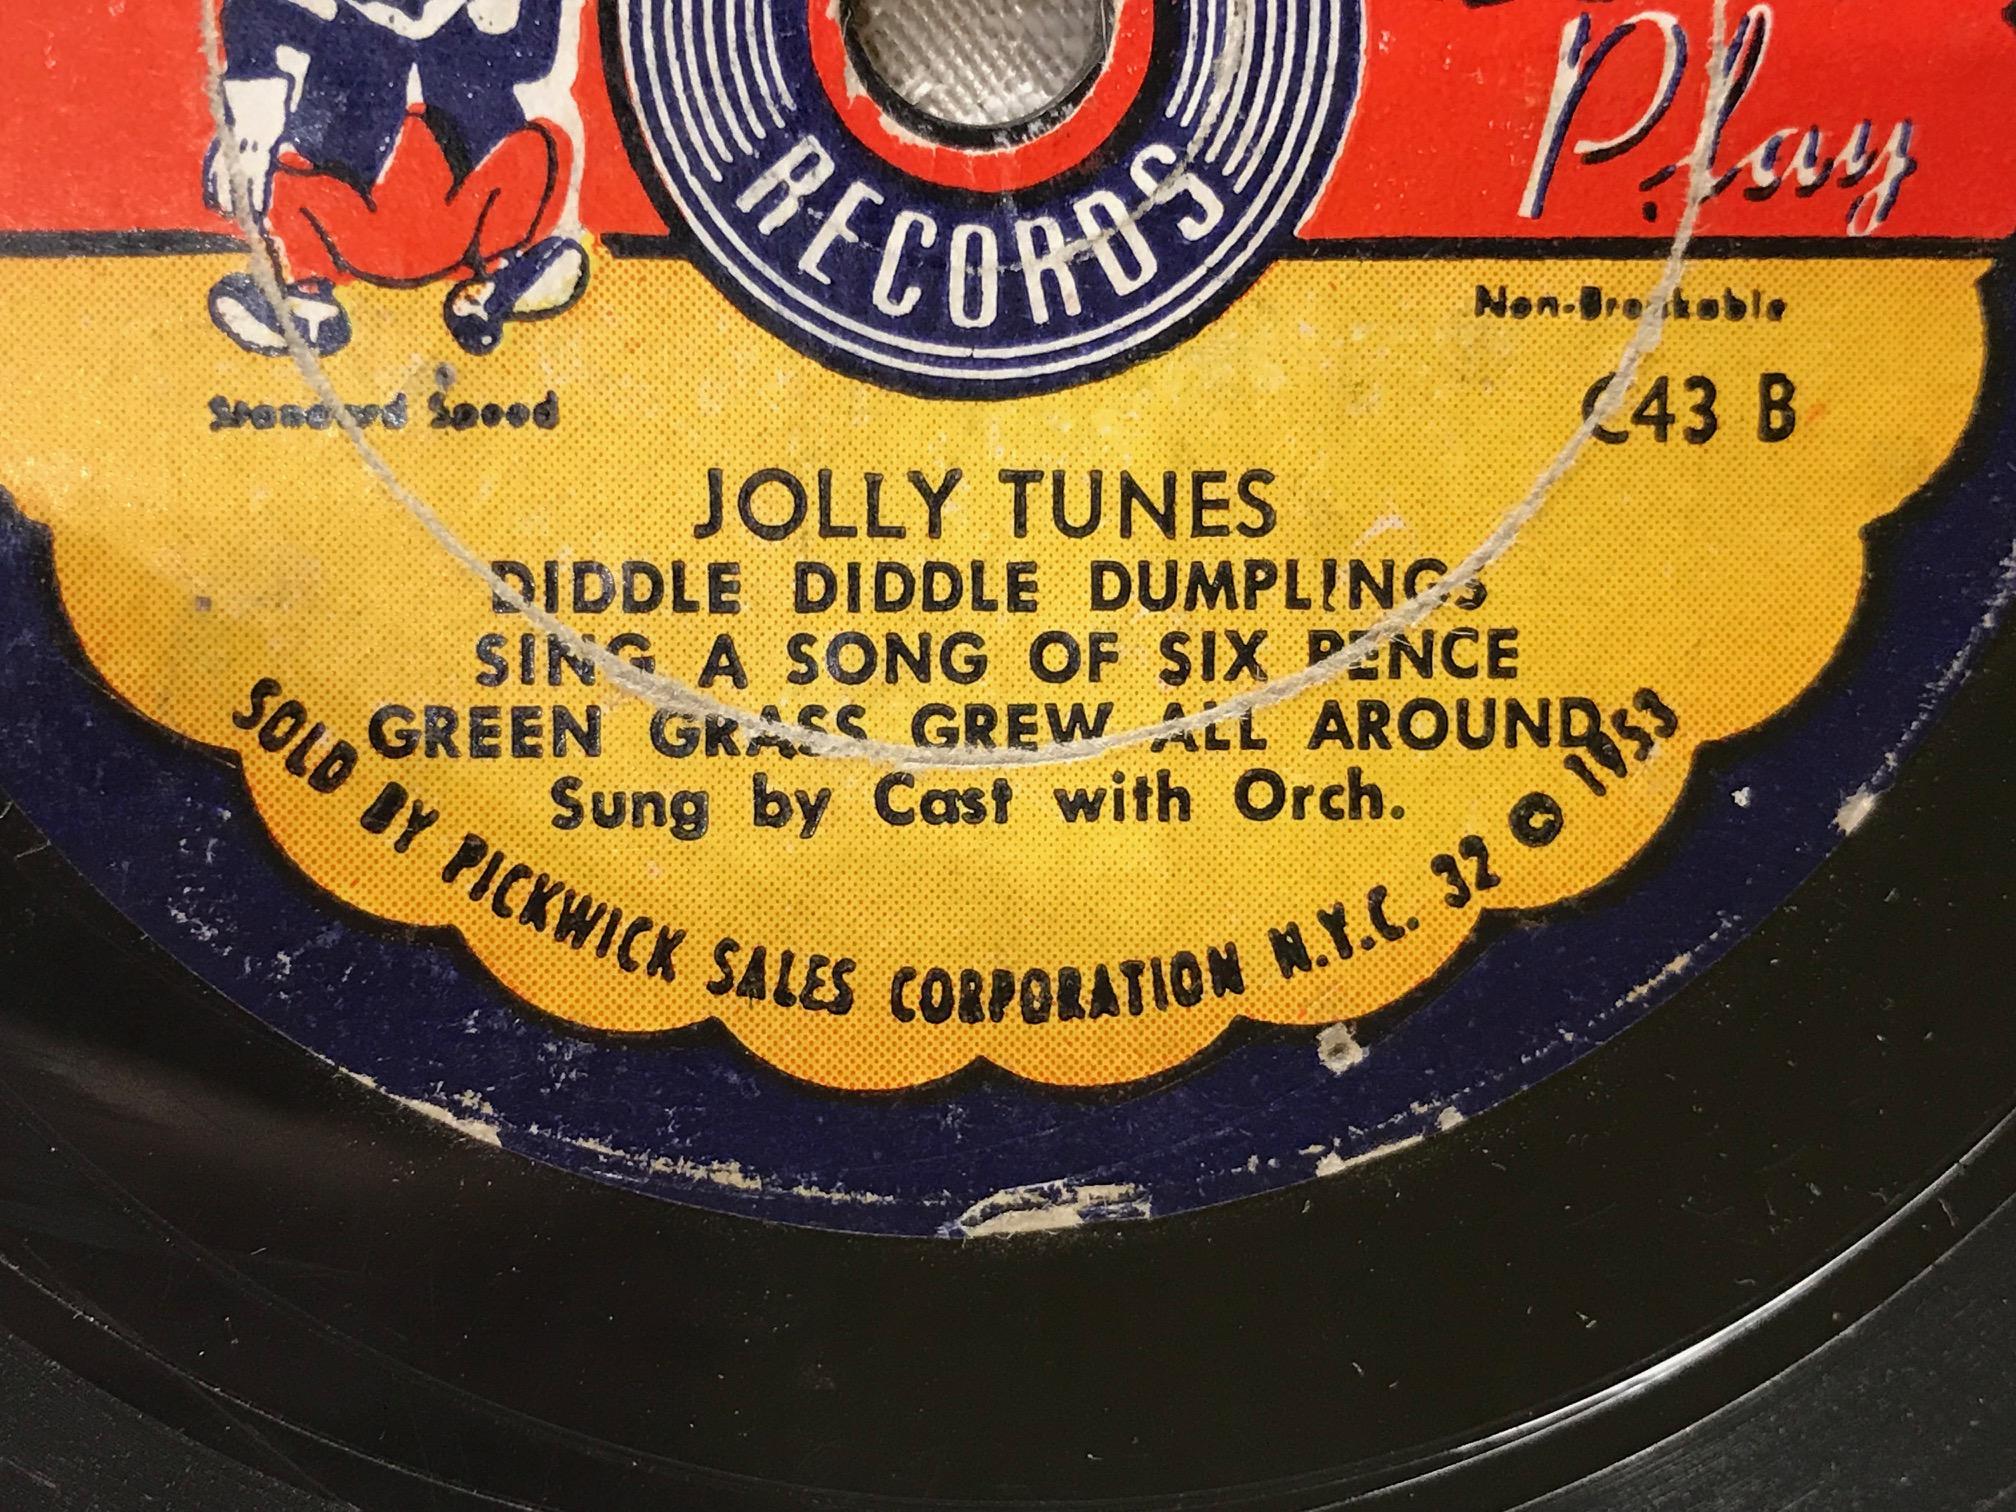 "1953 Cricket Records ""Jolly Tunes"": Cadmium (Cd): 192 ppm, Mercury (Hg): 22 ppm!!"